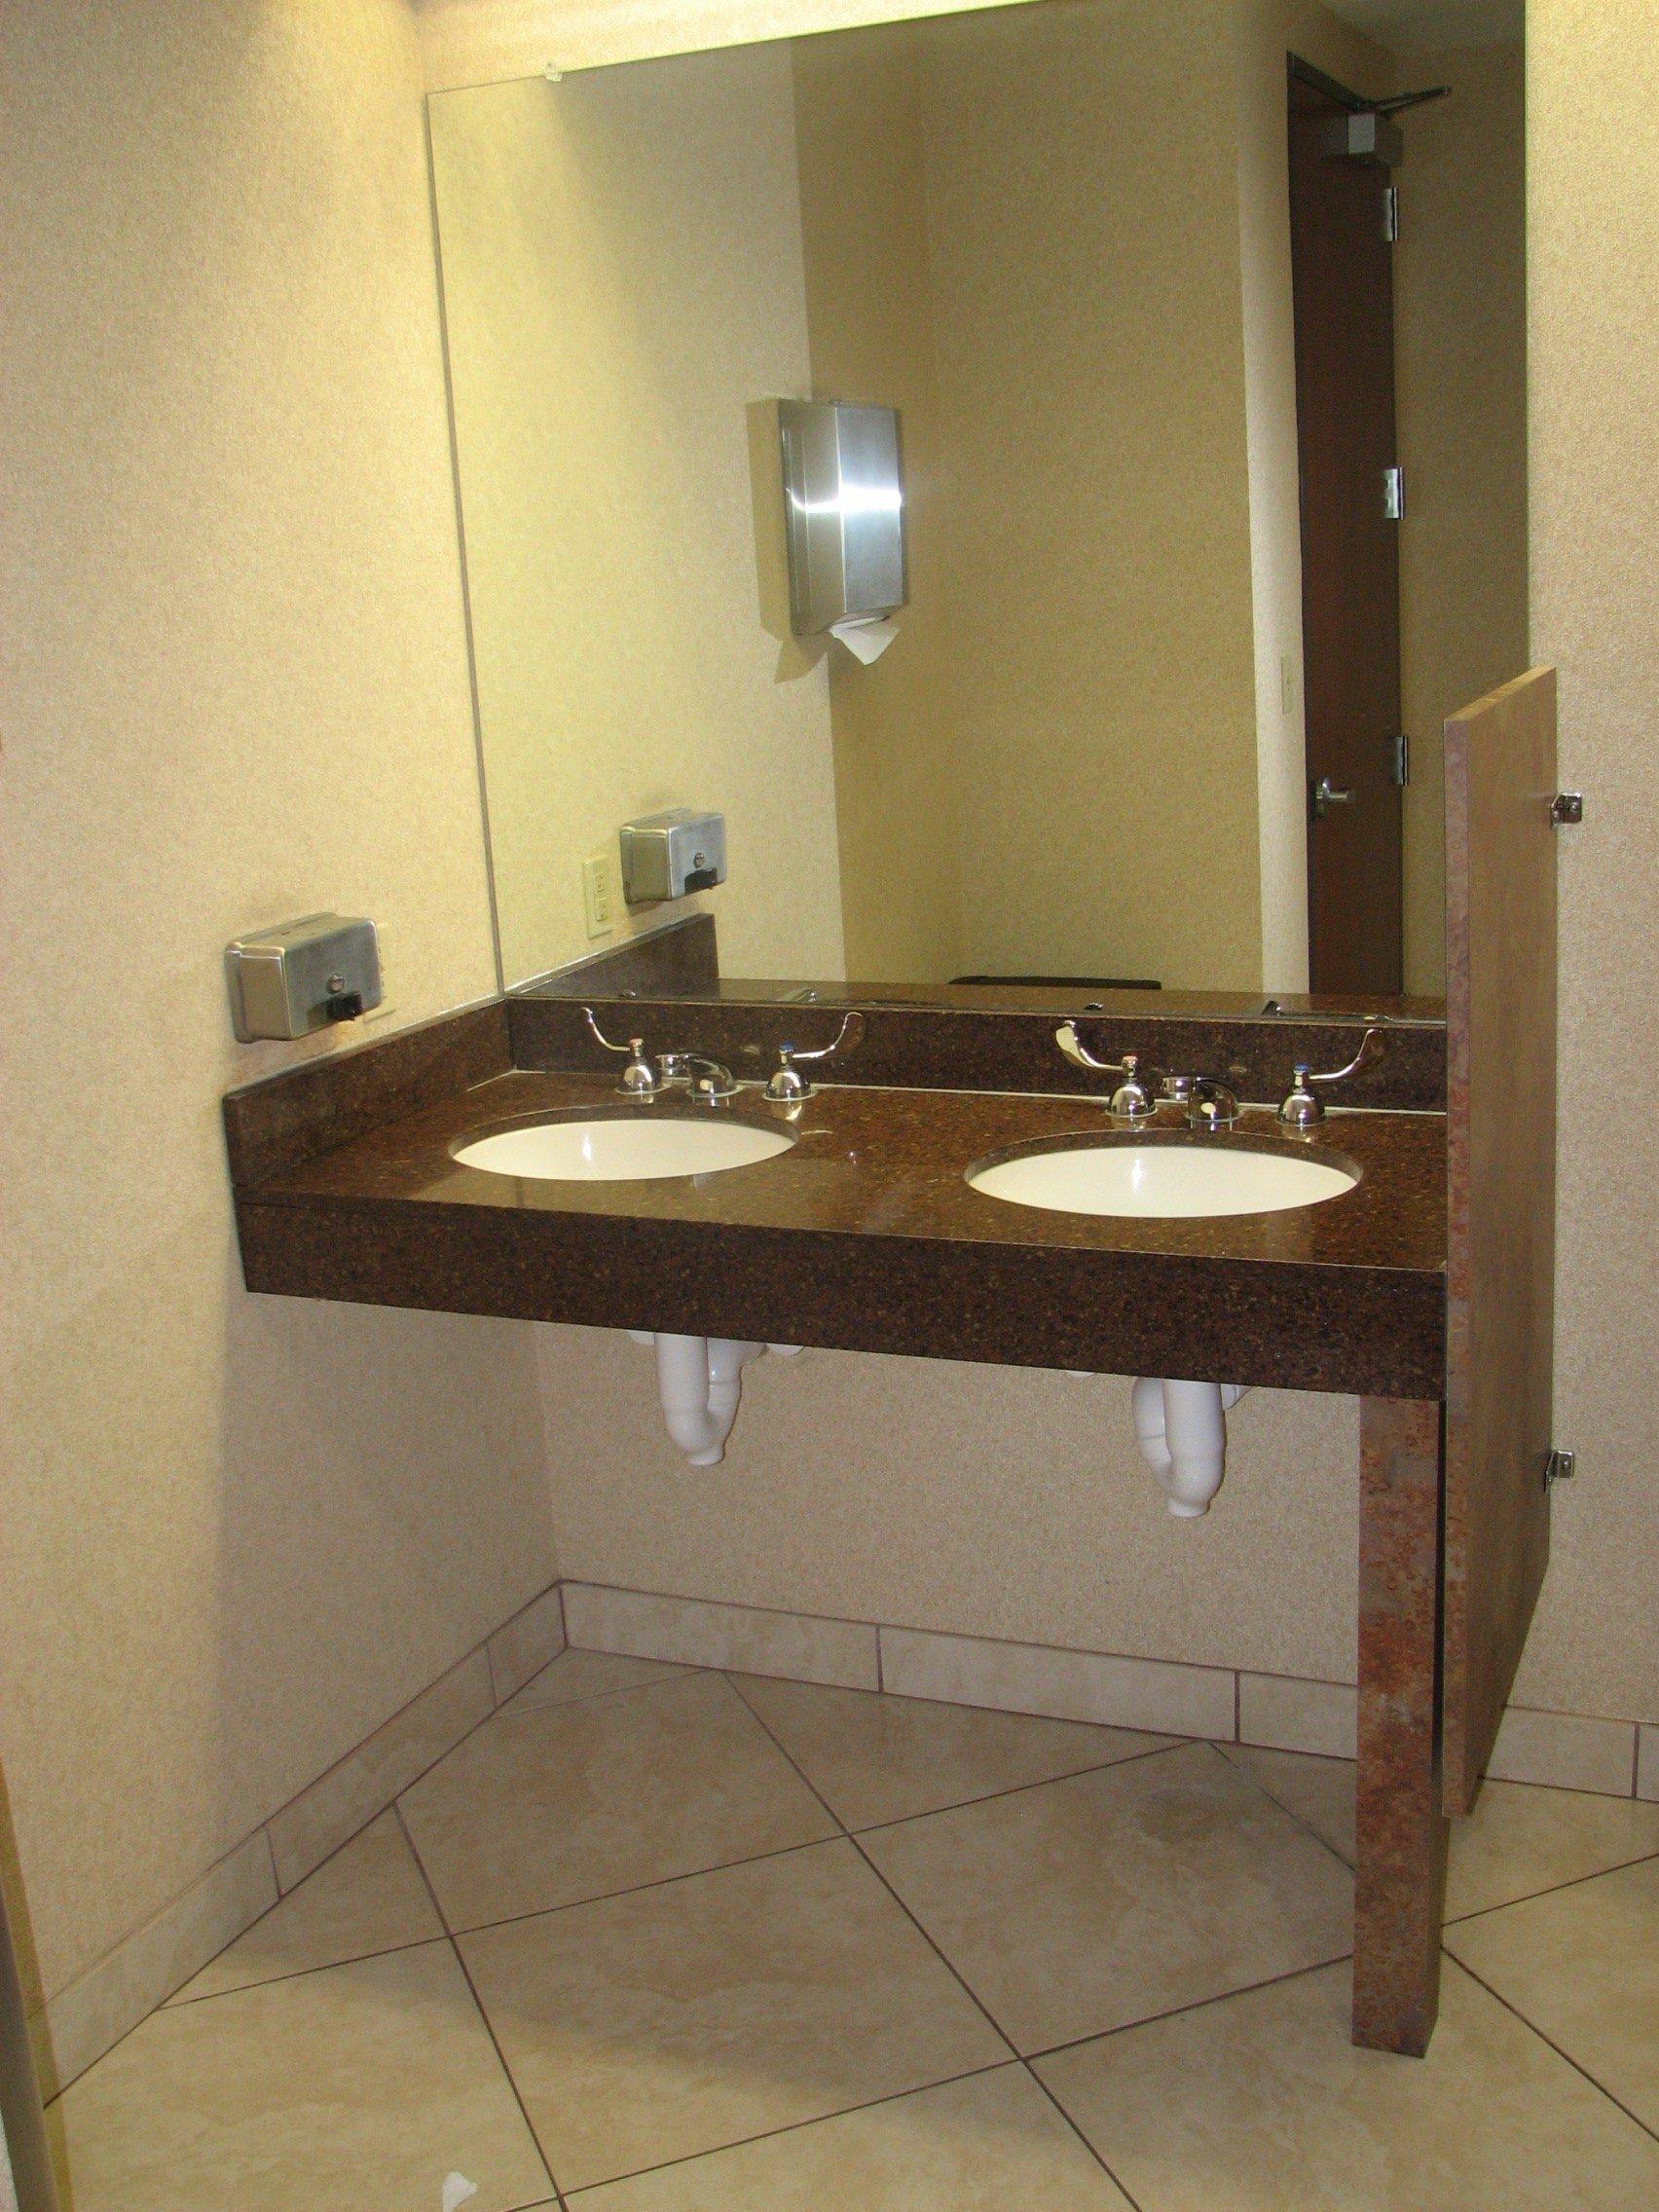 Nice Ada Compliant Bathroom Sinks Part - 9: Ada Bathroom Sink And Countertop Rukinetcom .